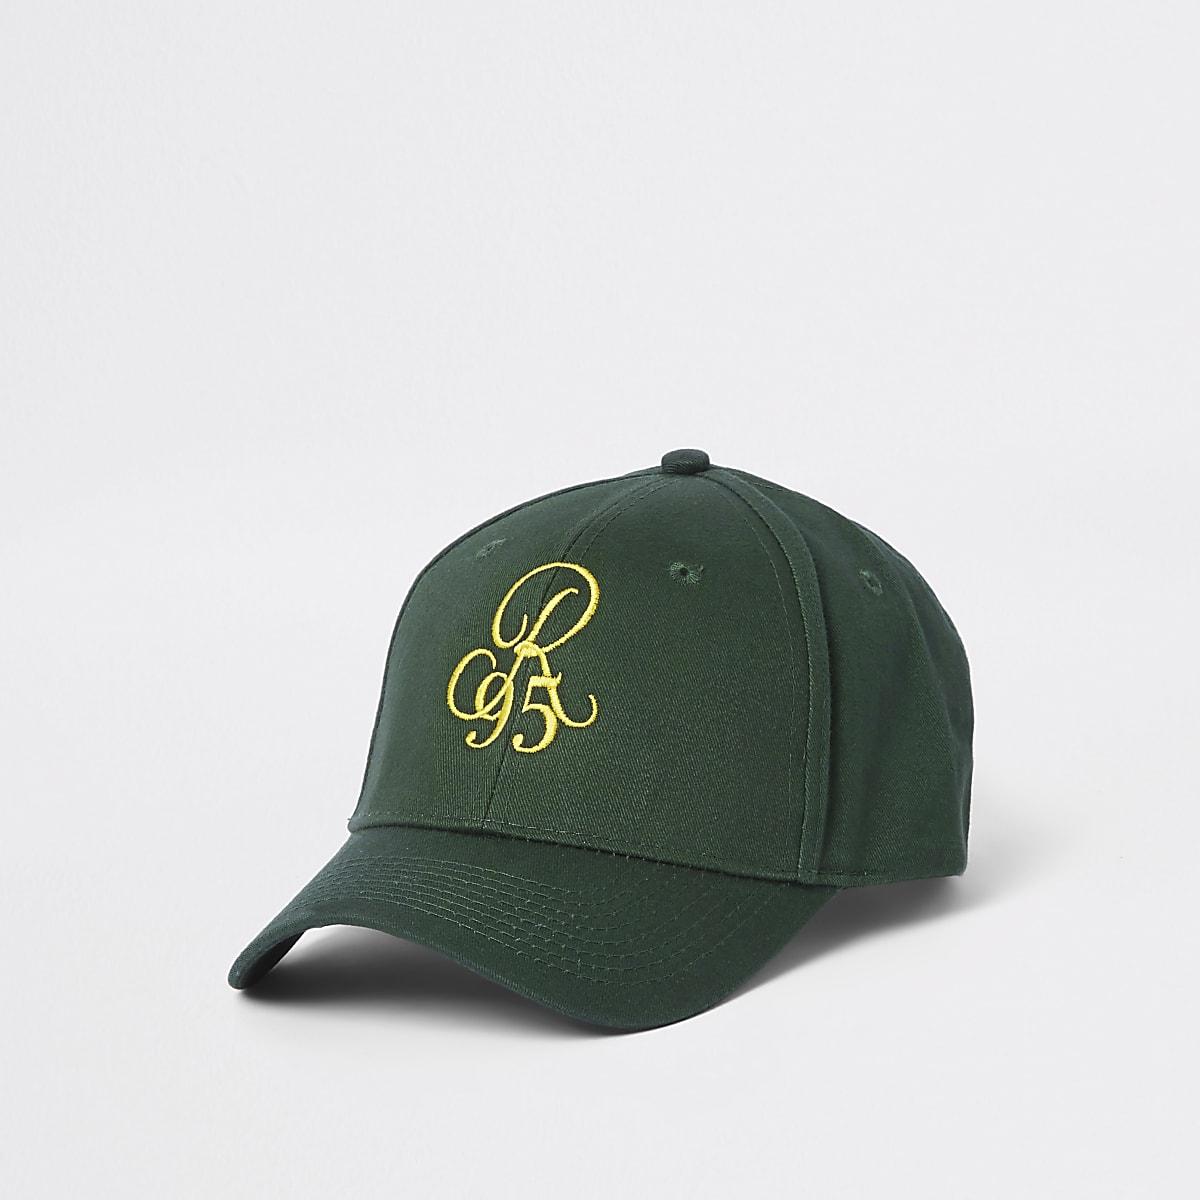 Green R95 baseball cap